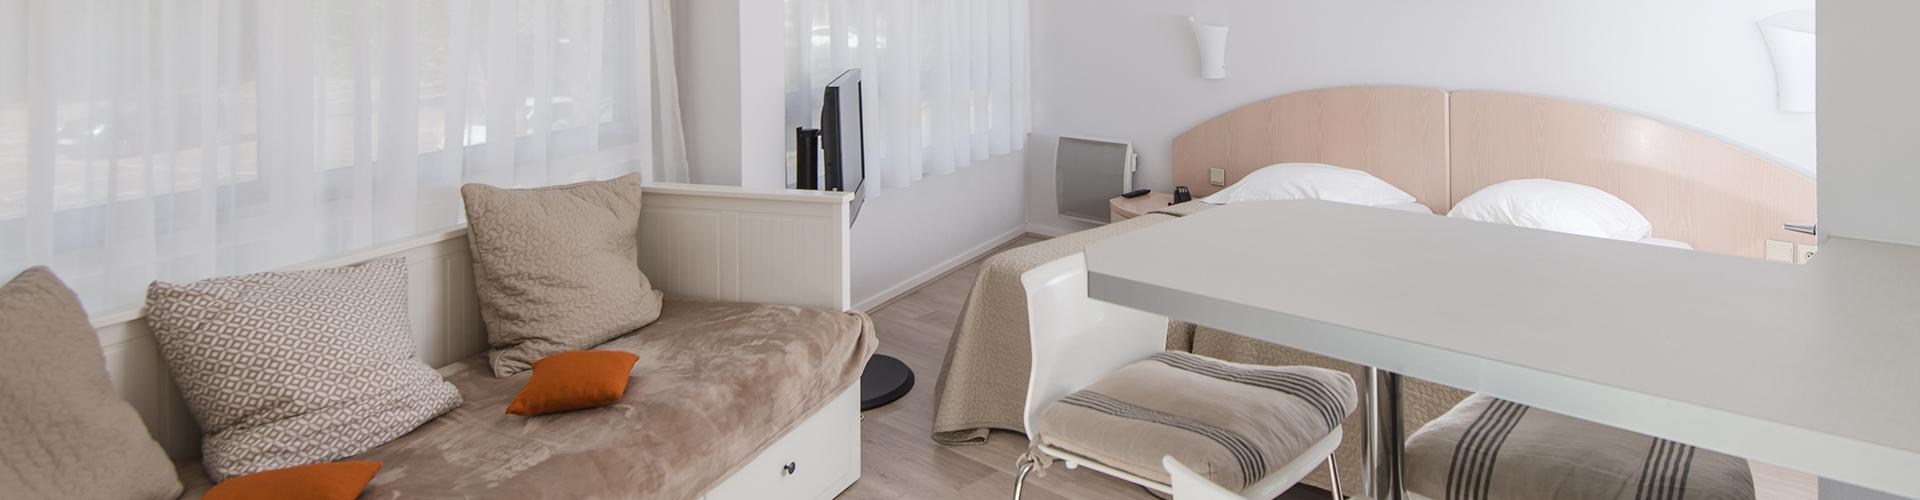 La r sidence avec appartement location dinard for Appart hotel dinard